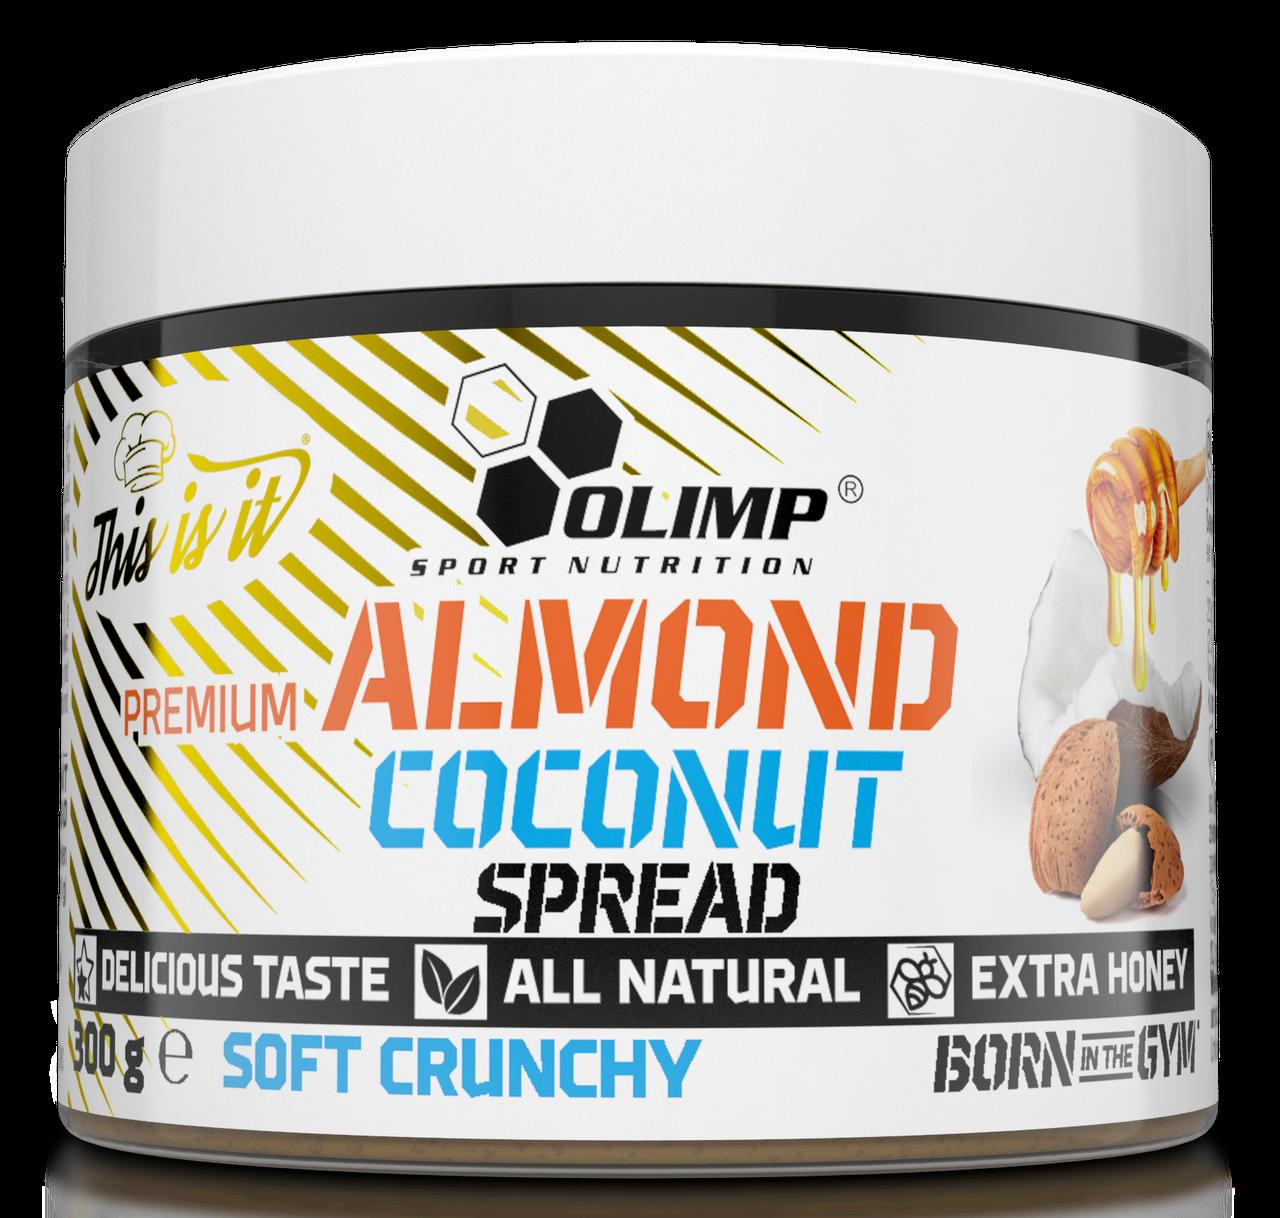 Мигдаль, какао, мед Olimp Premium Almond Coconut Spread soft crunchy( 300g)